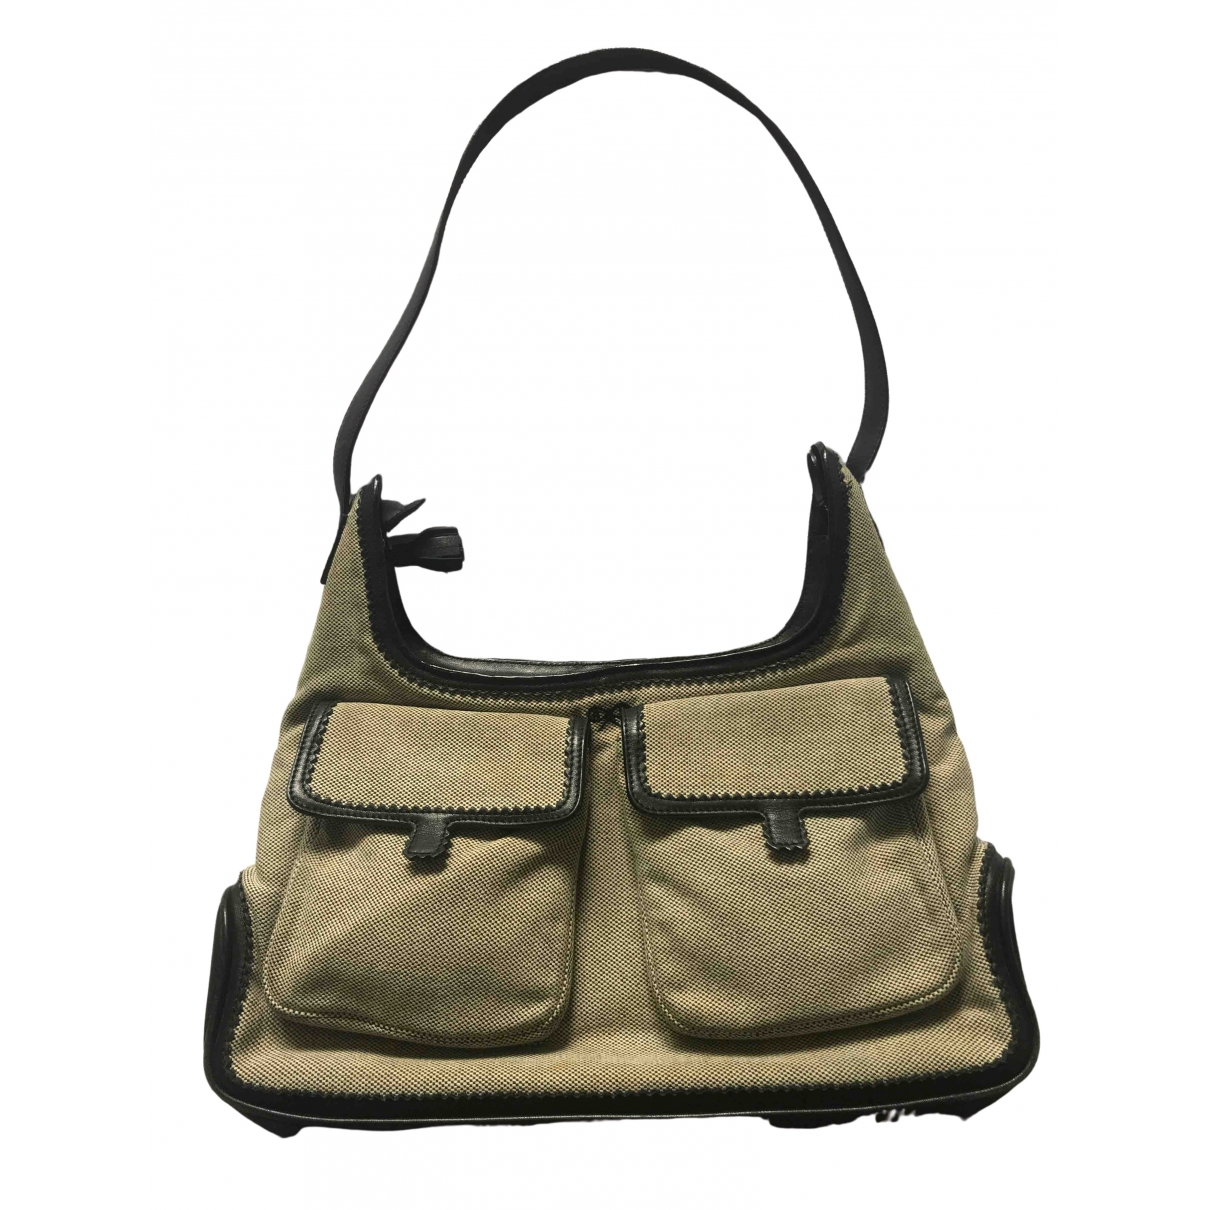 Anya Hindmarch \N Beige Cloth handbag for Women \N